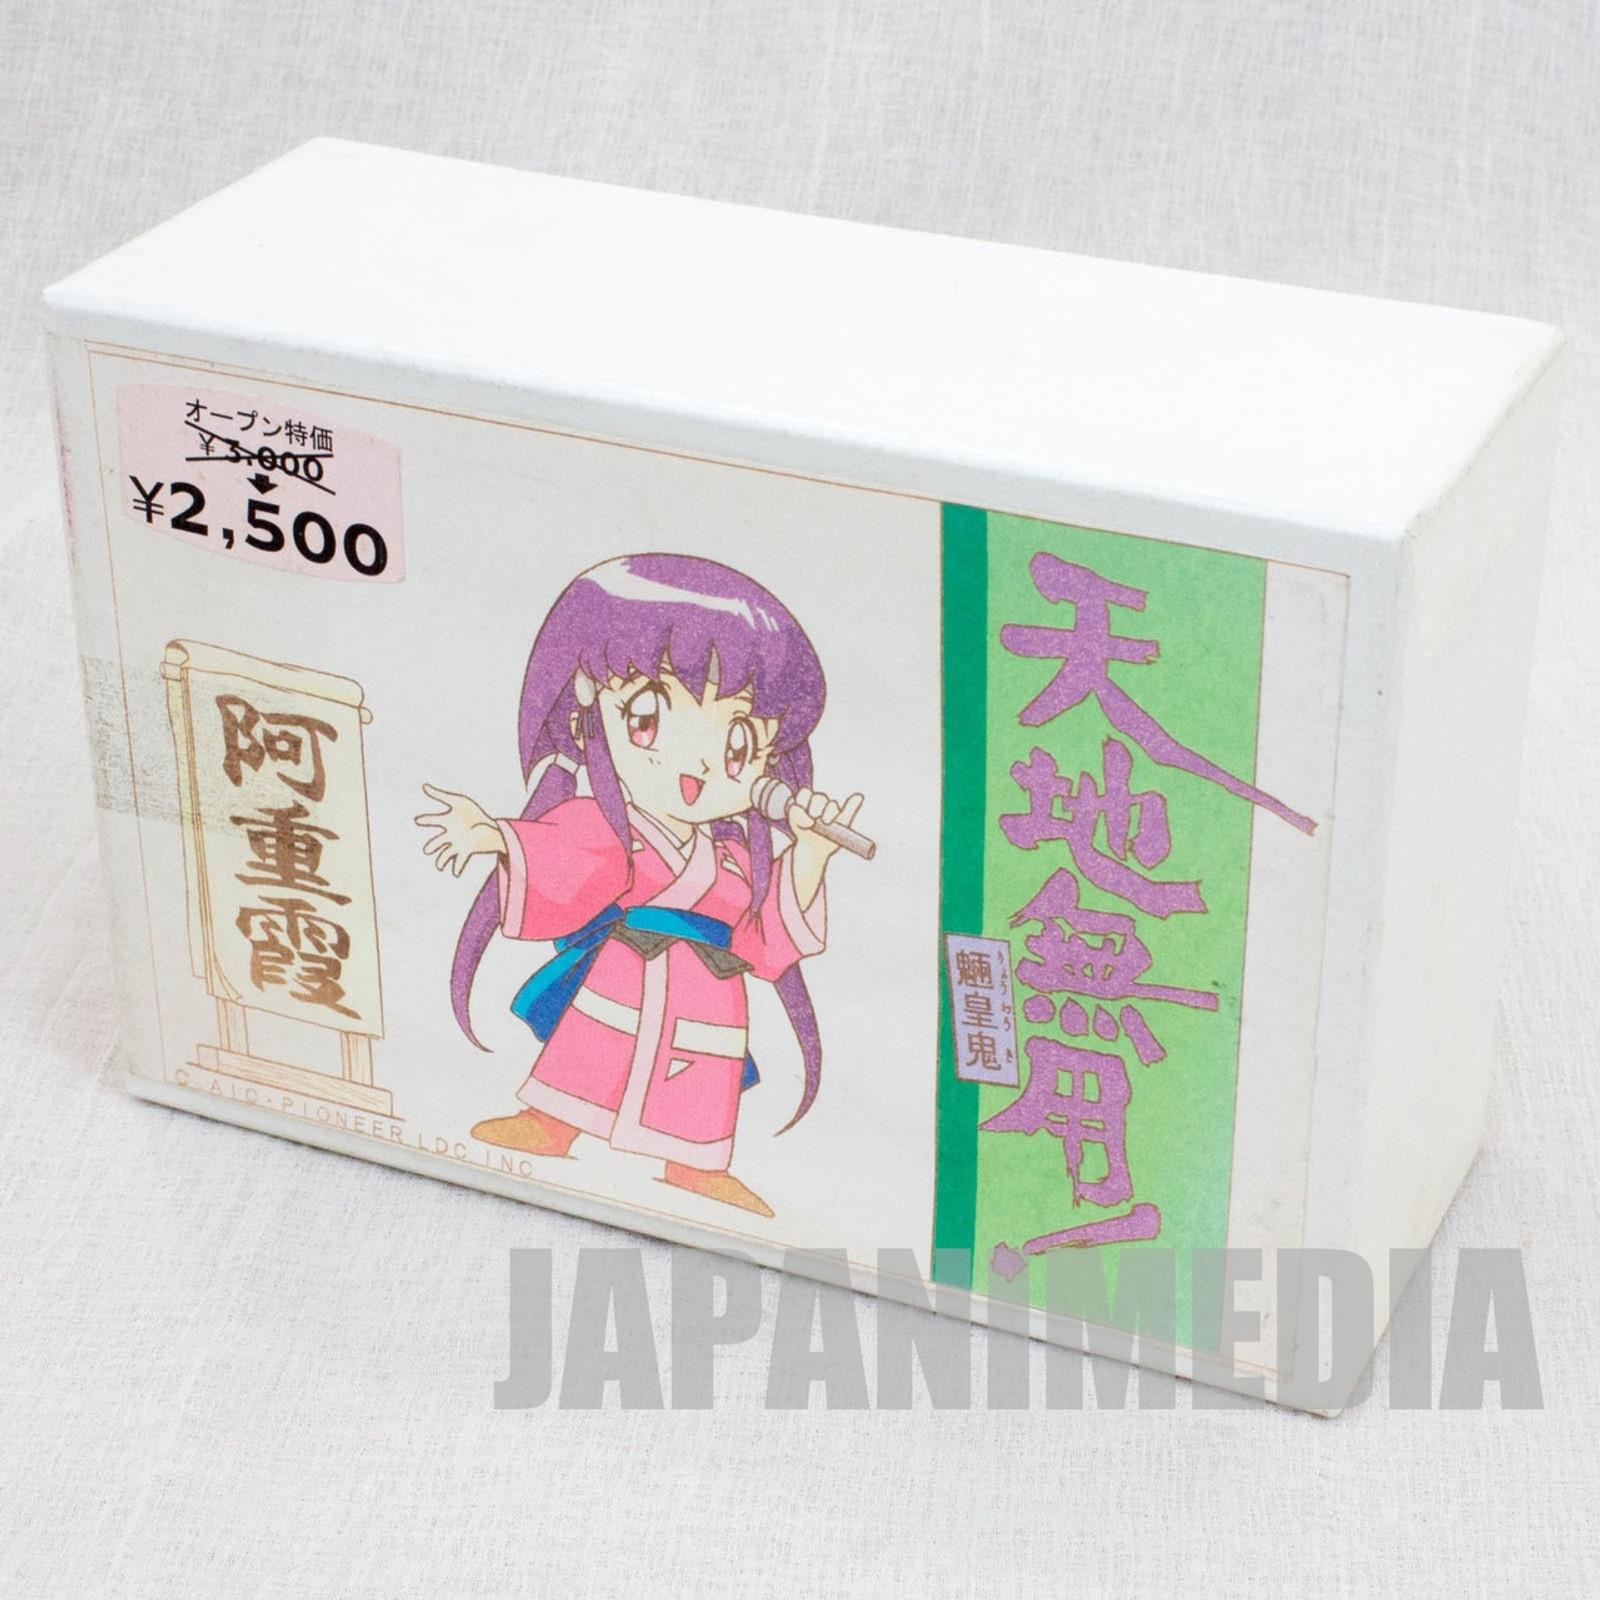 Tenchi Muyo! Ryo-ohki Ayeka Masaki Jurai Model Kit JAPAN ANIME MANGA